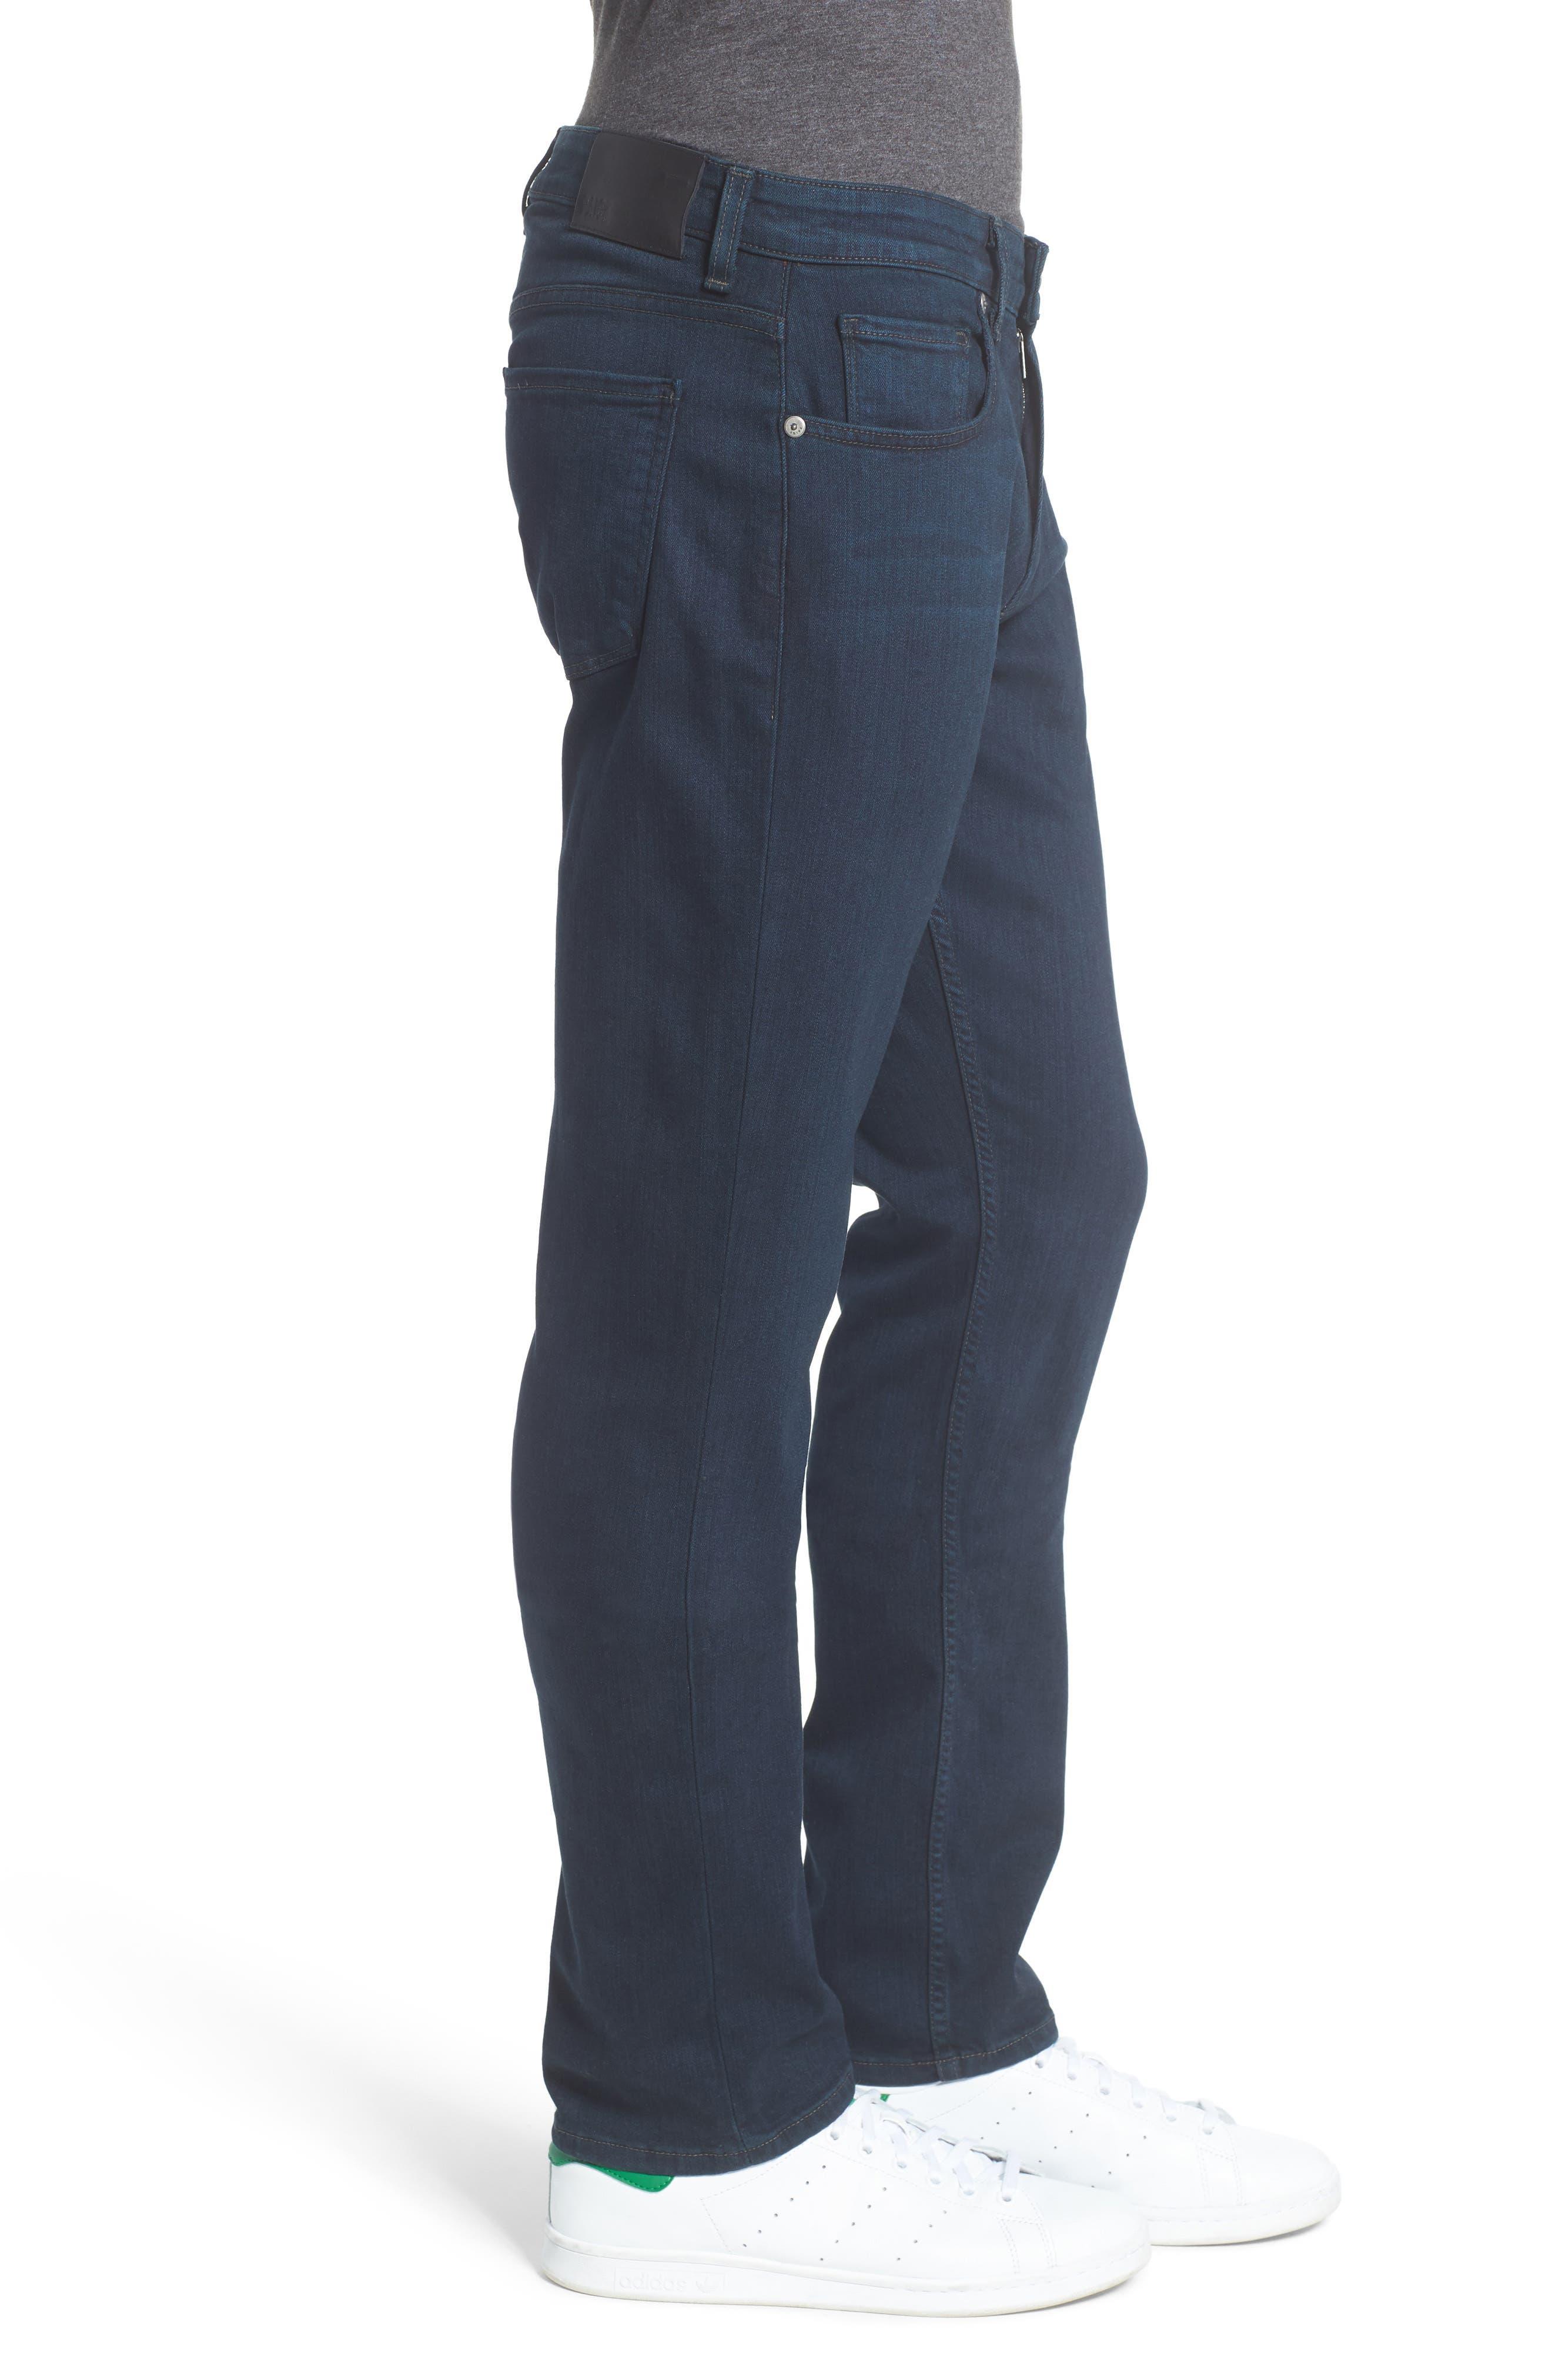 Transcend - Federal Slim Straight Leg Jeans,                             Alternate thumbnail 3, color,                             ARLO